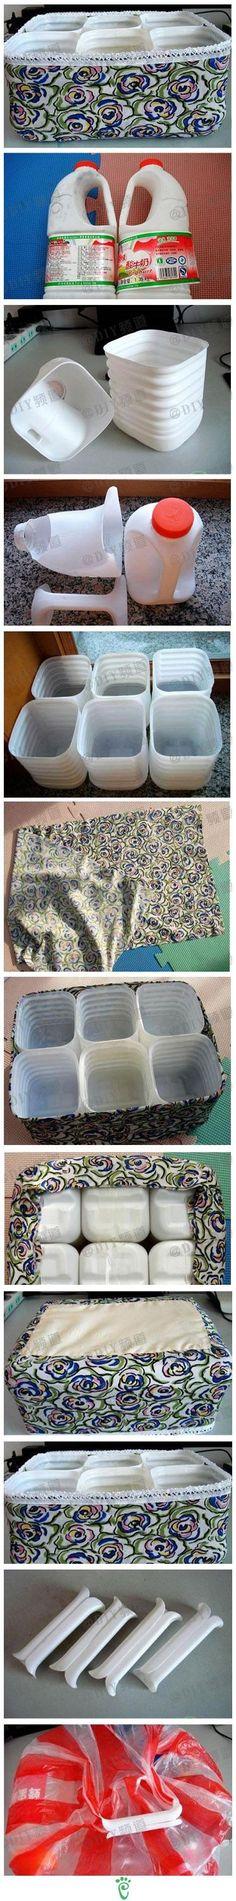 bos-deterjan-kutularindan-lazimlik-yapmak